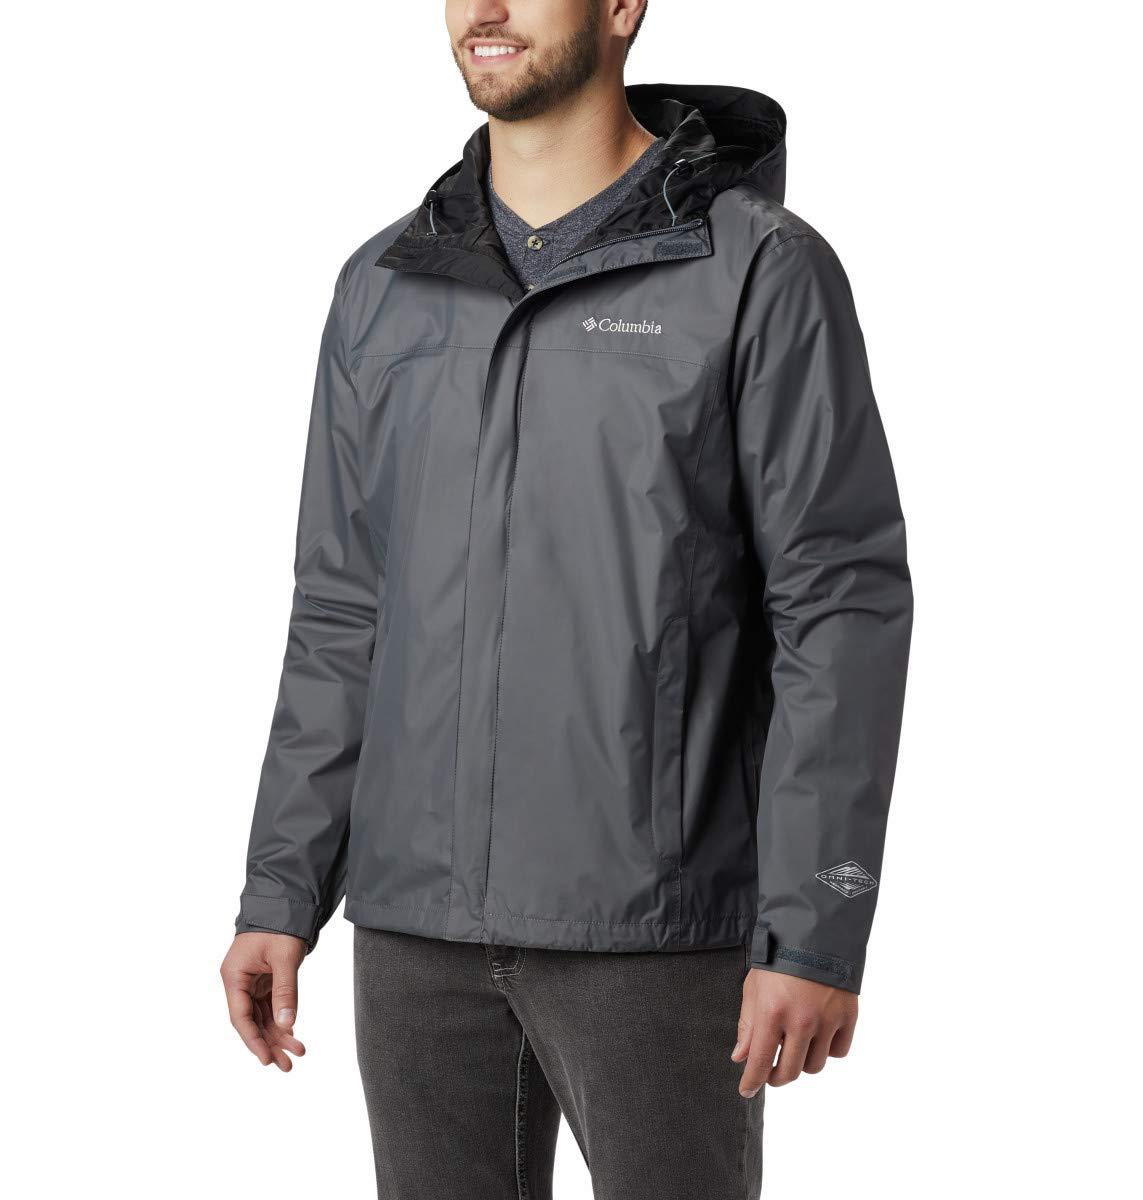 Columbia Men's Watertight Ii Jacket, Graphite, Large